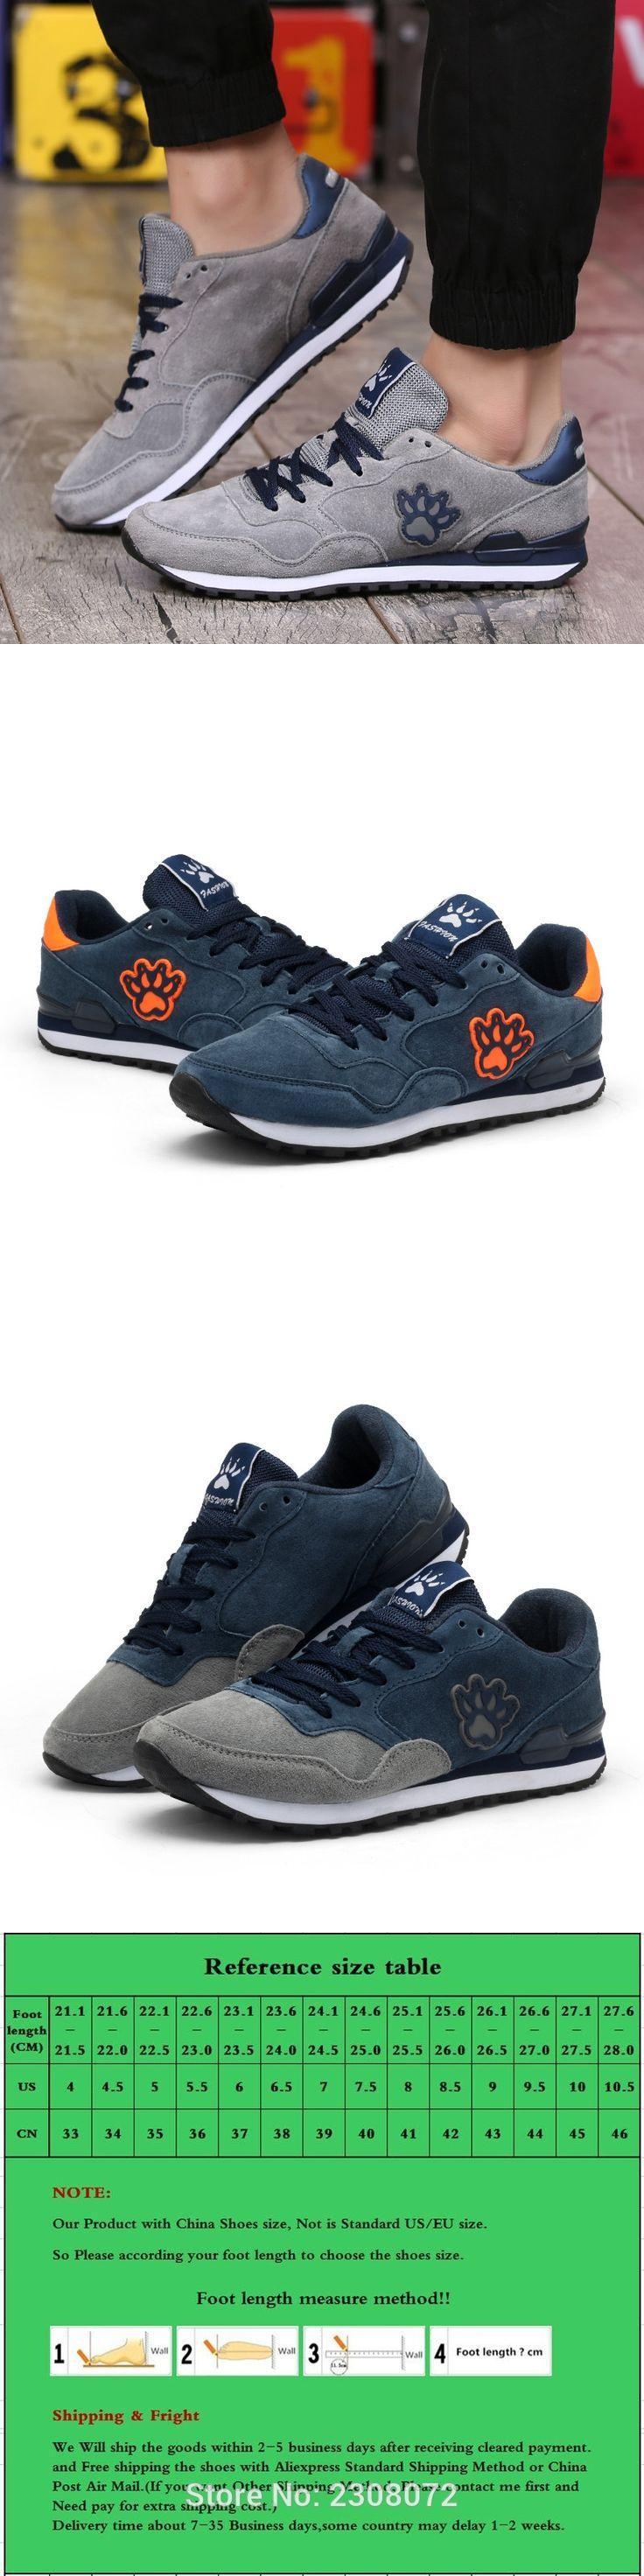 KUYUPP Superstar Outdoor Men Shoes Men's Running Shoes Espadrilles Men Breathable Outdoor Shoes Zapatillas Max 95 New 2017 B26